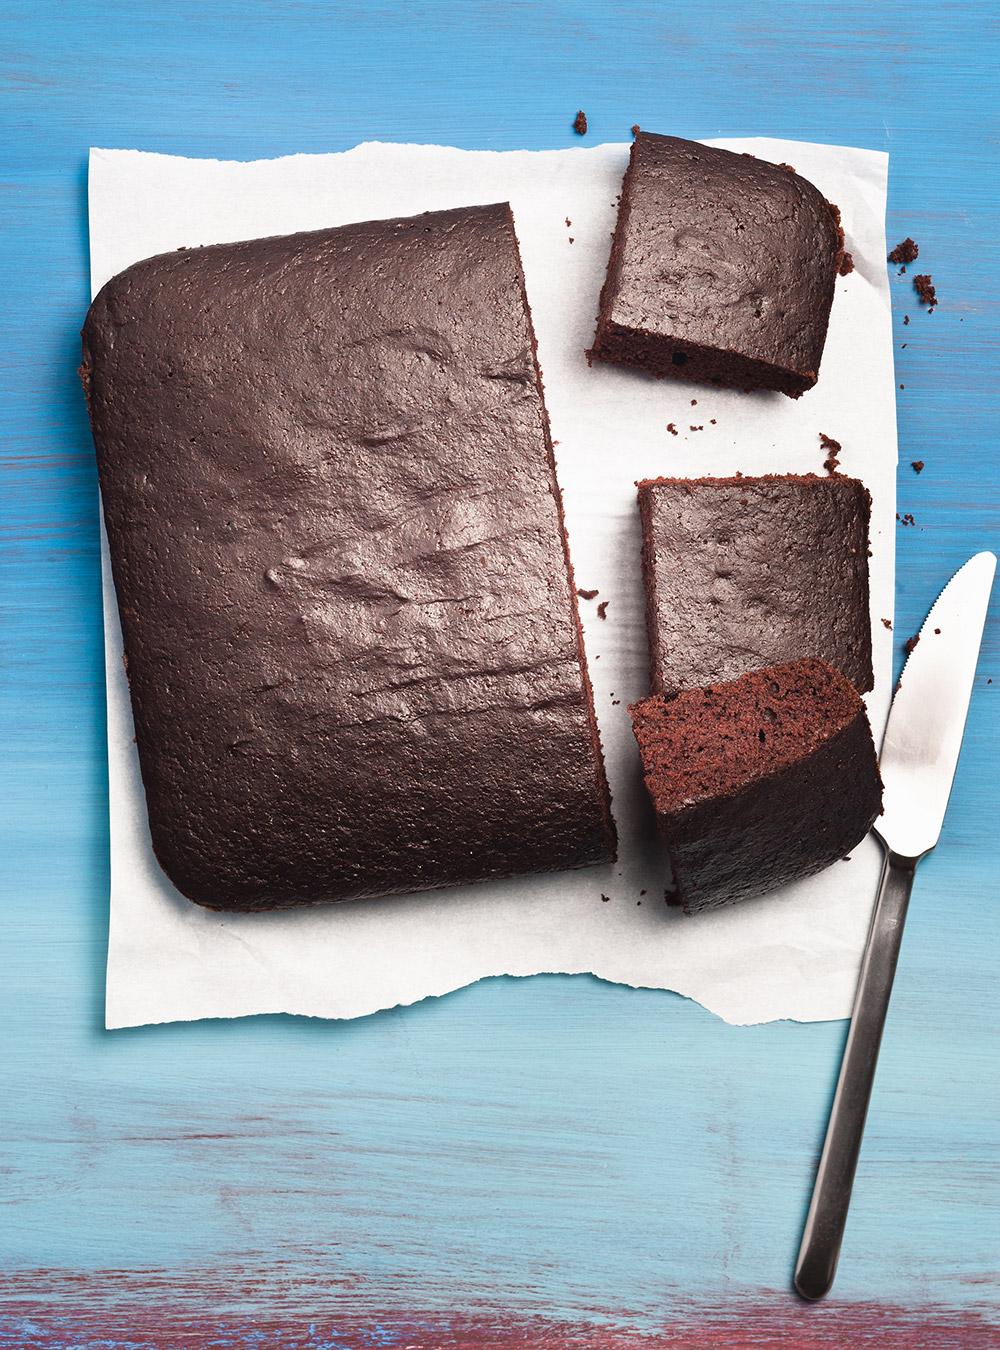 Gâteau au chocolat sans salir un bol | ricardo